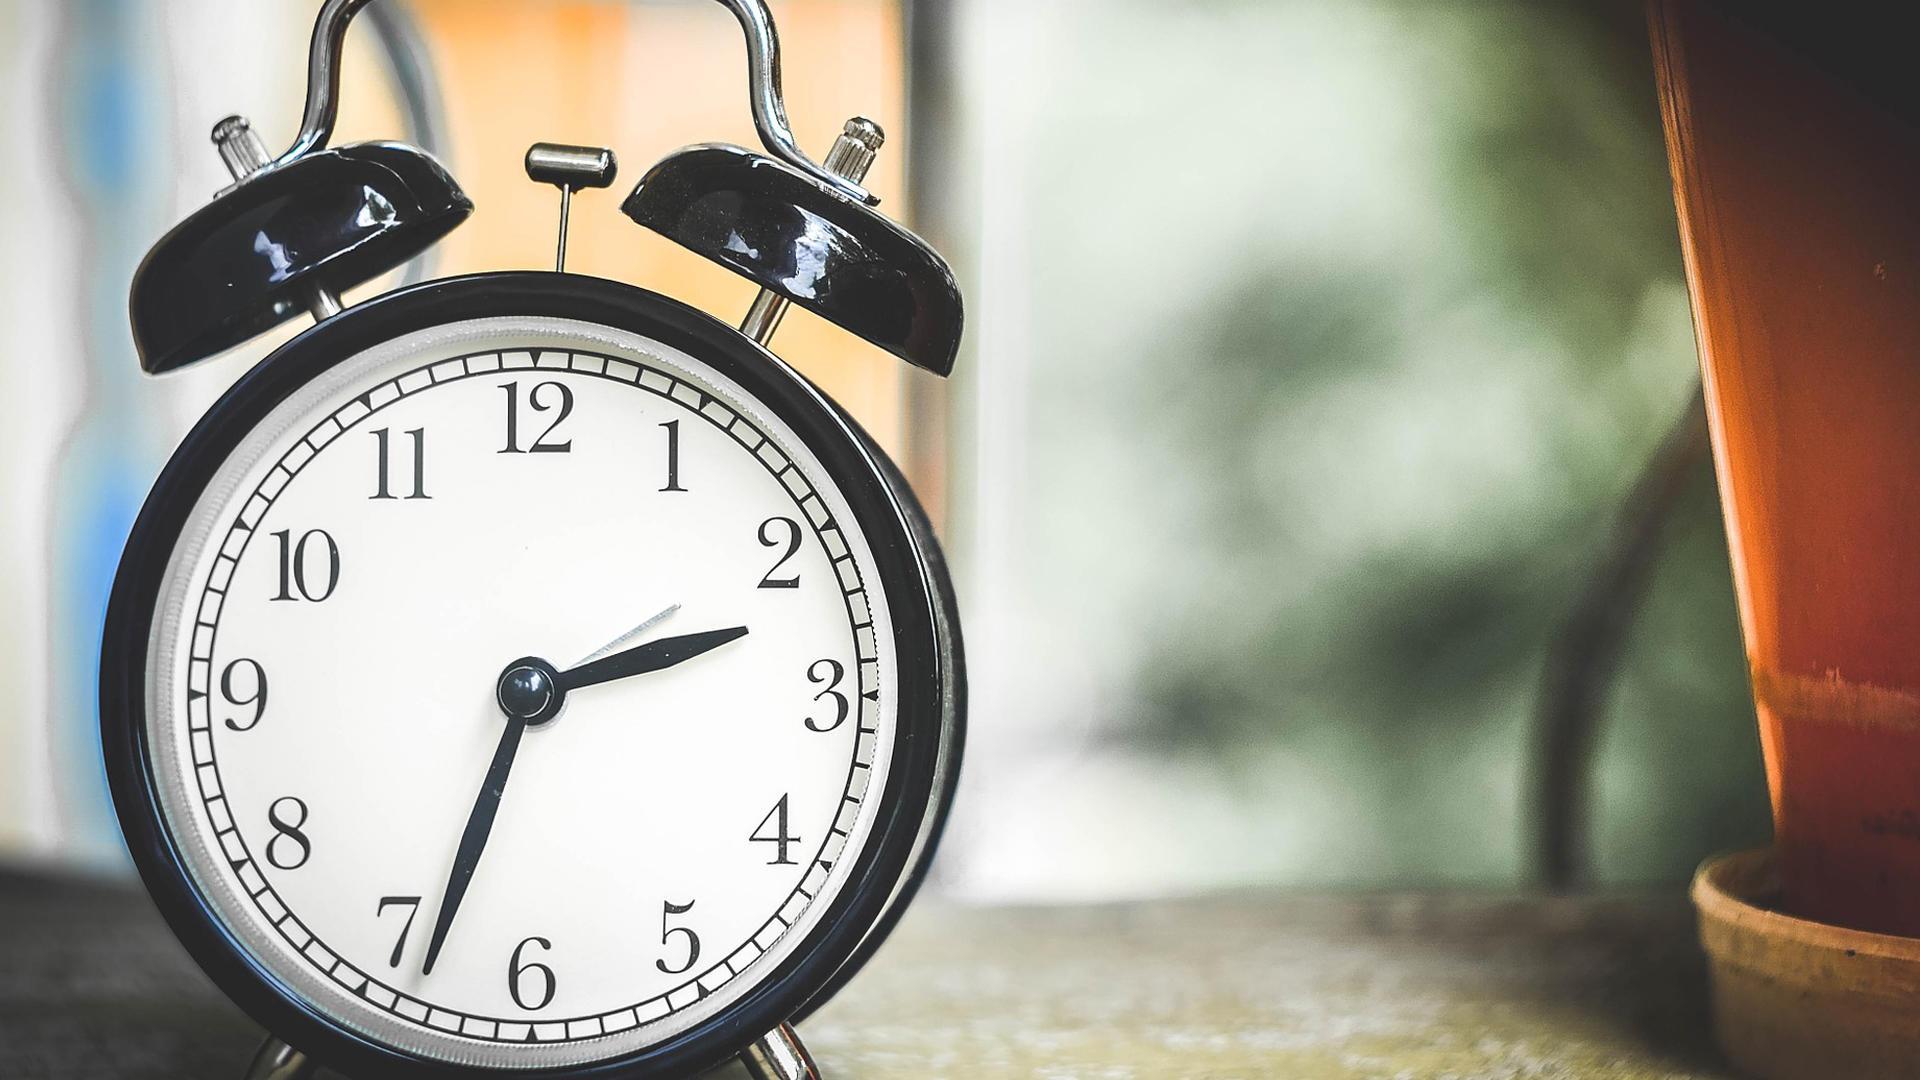 Fall Back Daylight saving time ends Sunday morning WBNS 10TV 1920x1080